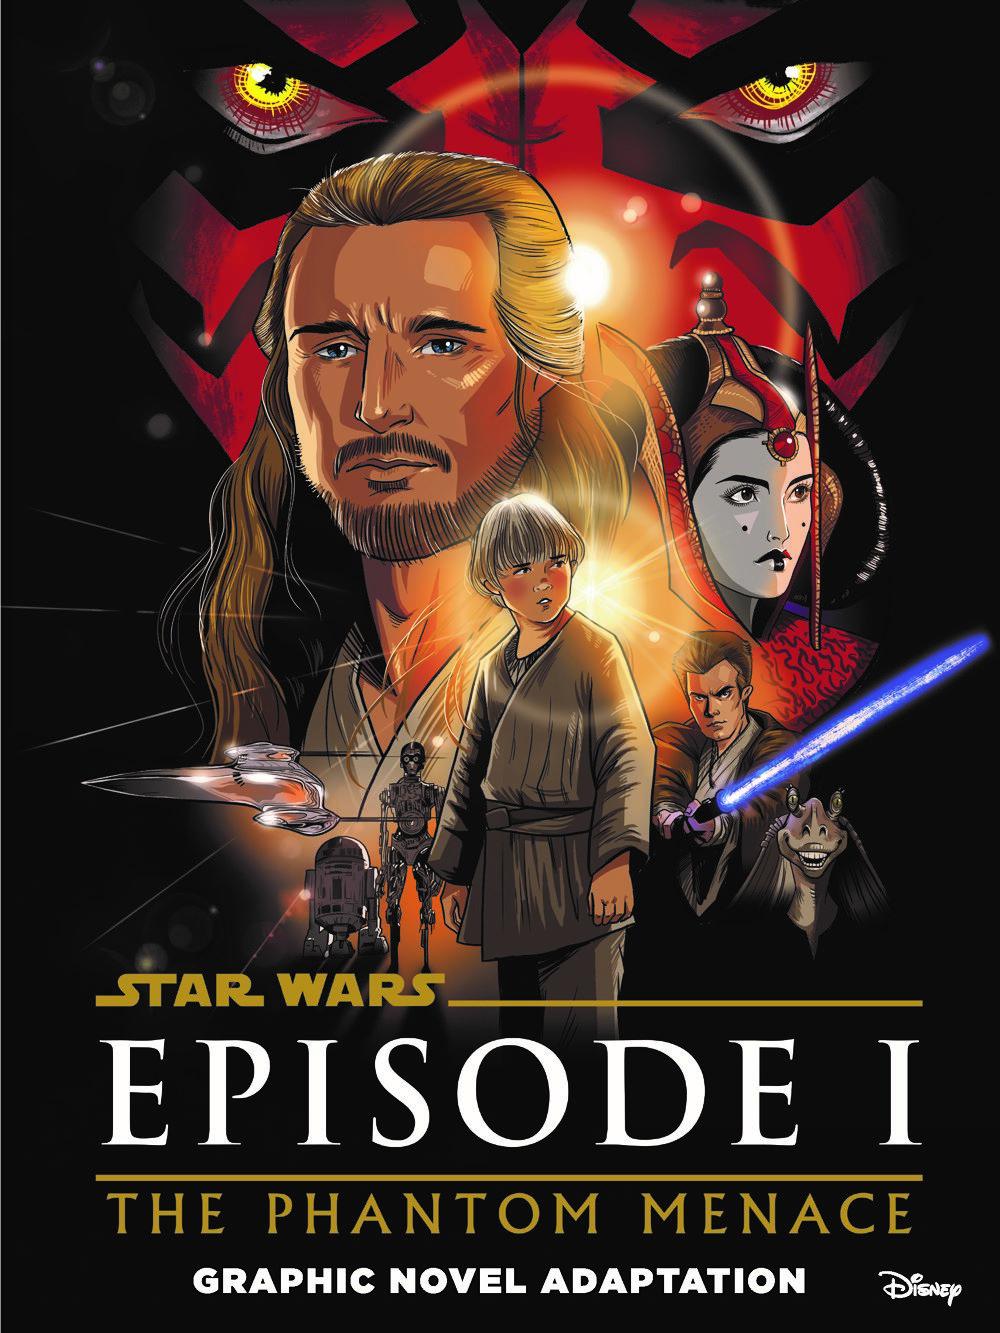 SW_The-Phantom-Menace_Cover ComicList Previews: STAR WARS THE PHANTOM MENACE GRAPHIC NOVEL ADAPTATION GN